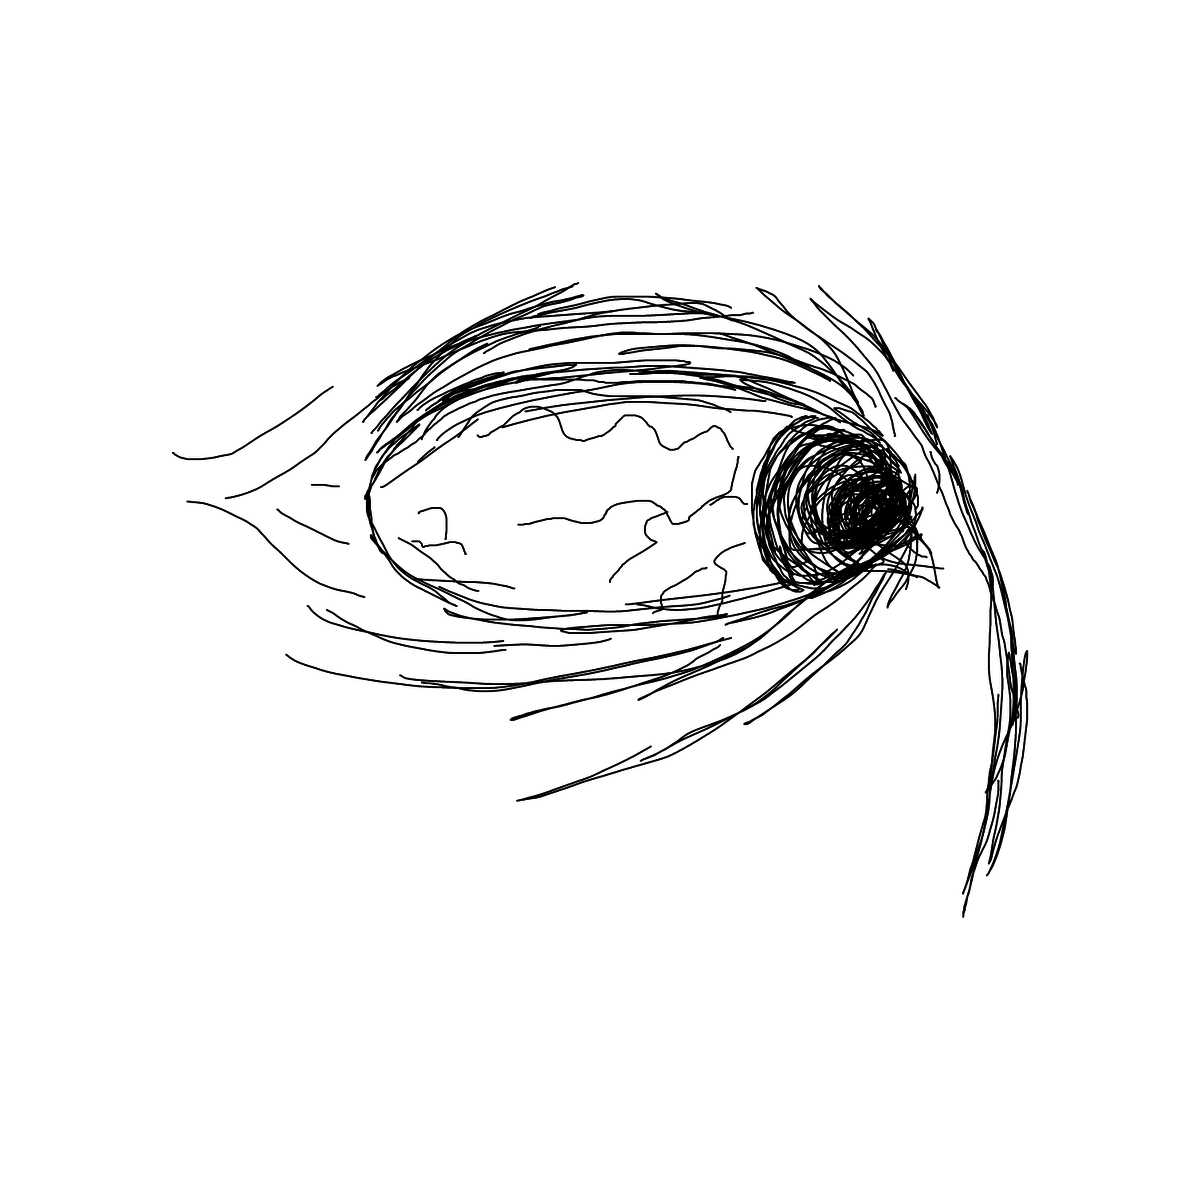 BAAAM drawing#18872 lat:-23.5477046966552730lng: -46.6355094909668000